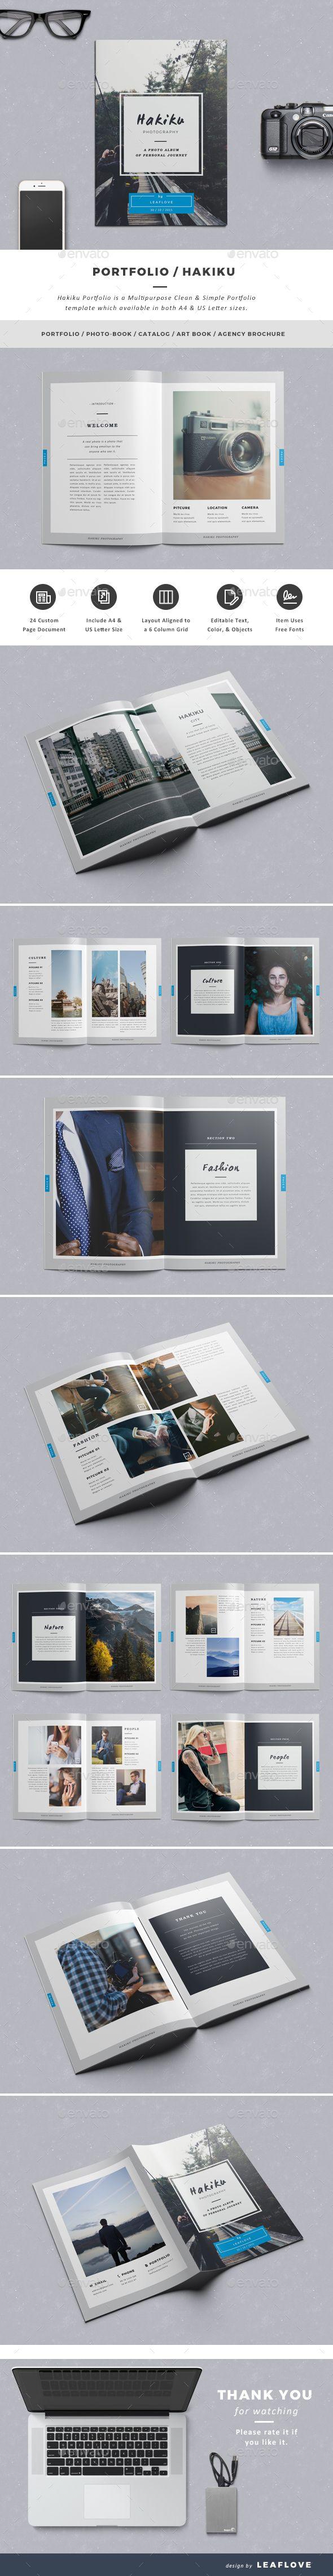 Portfolio / Hakiku Brochure Template InDesign INDD #design Download: http://graphicriver.net/item/portfolio-hakiku/13486618?ref=ksioks